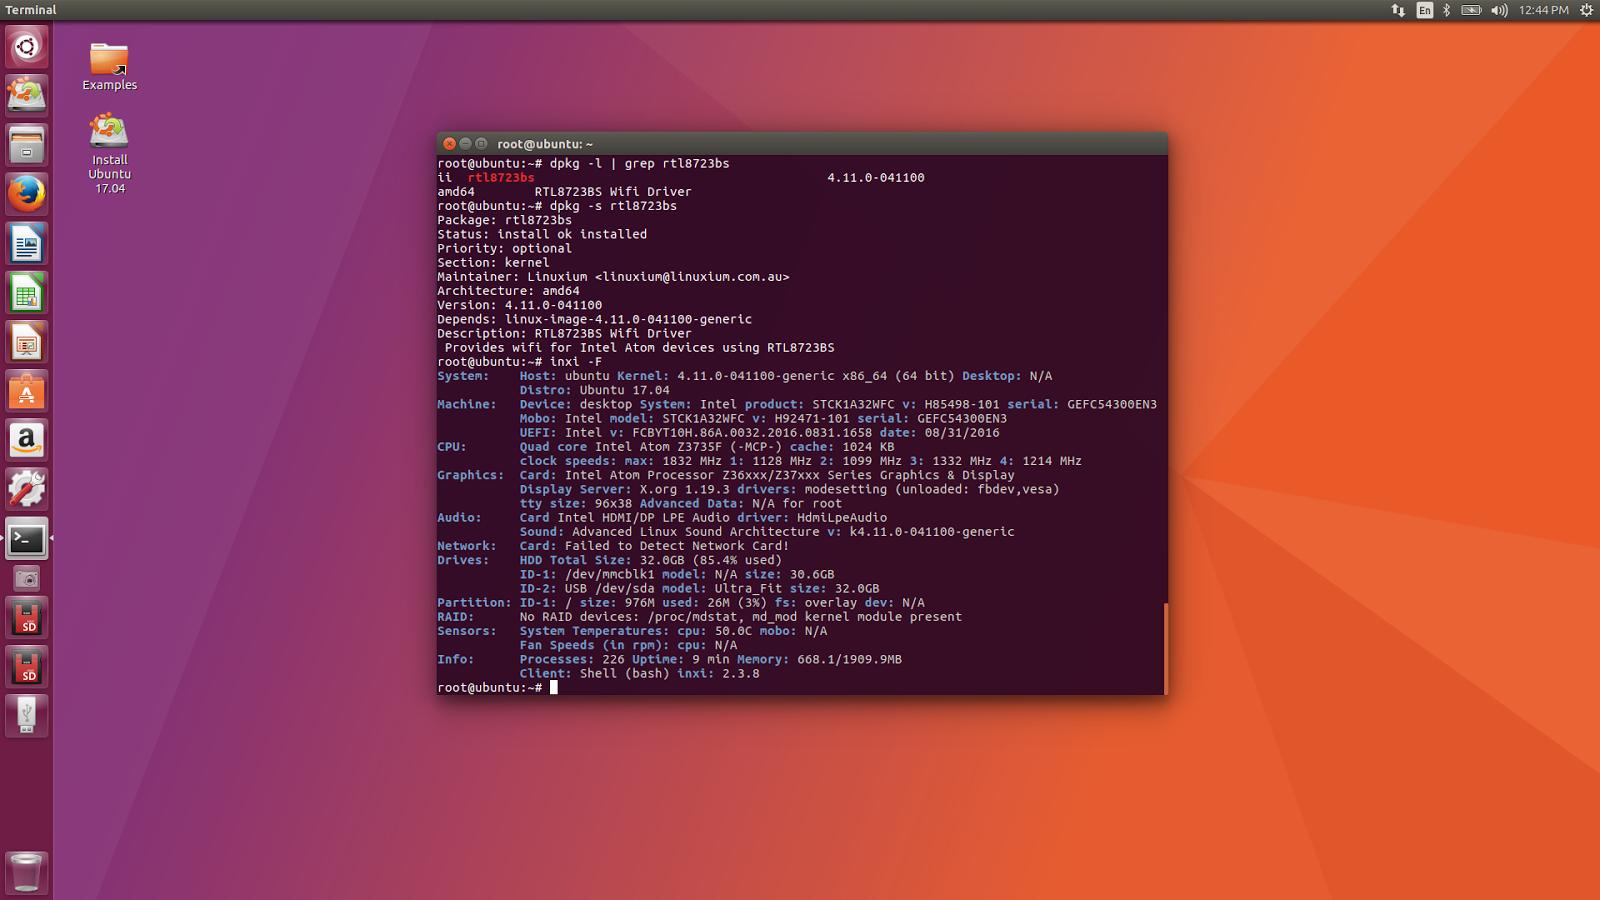 linuxium com au: Interim RTL8723BS wifi packages for mainline kernel